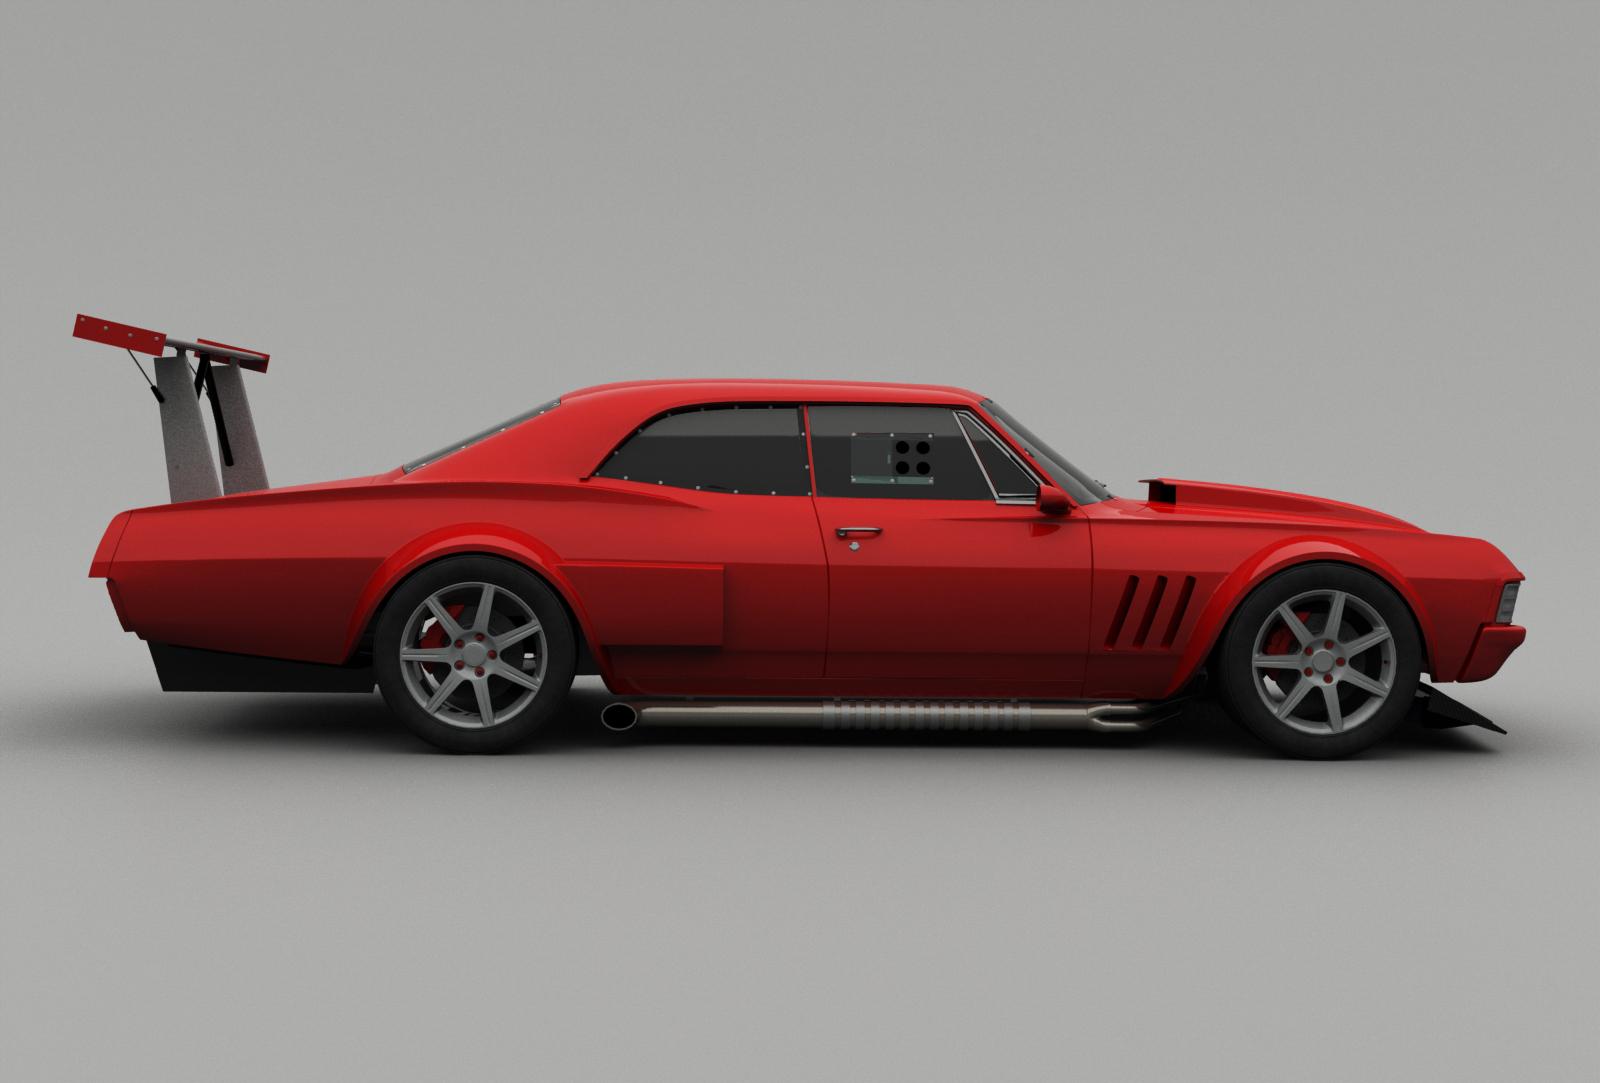 2013-03_The Crew_F.Beudin_Chevrolet Impala-1967-Racing_10